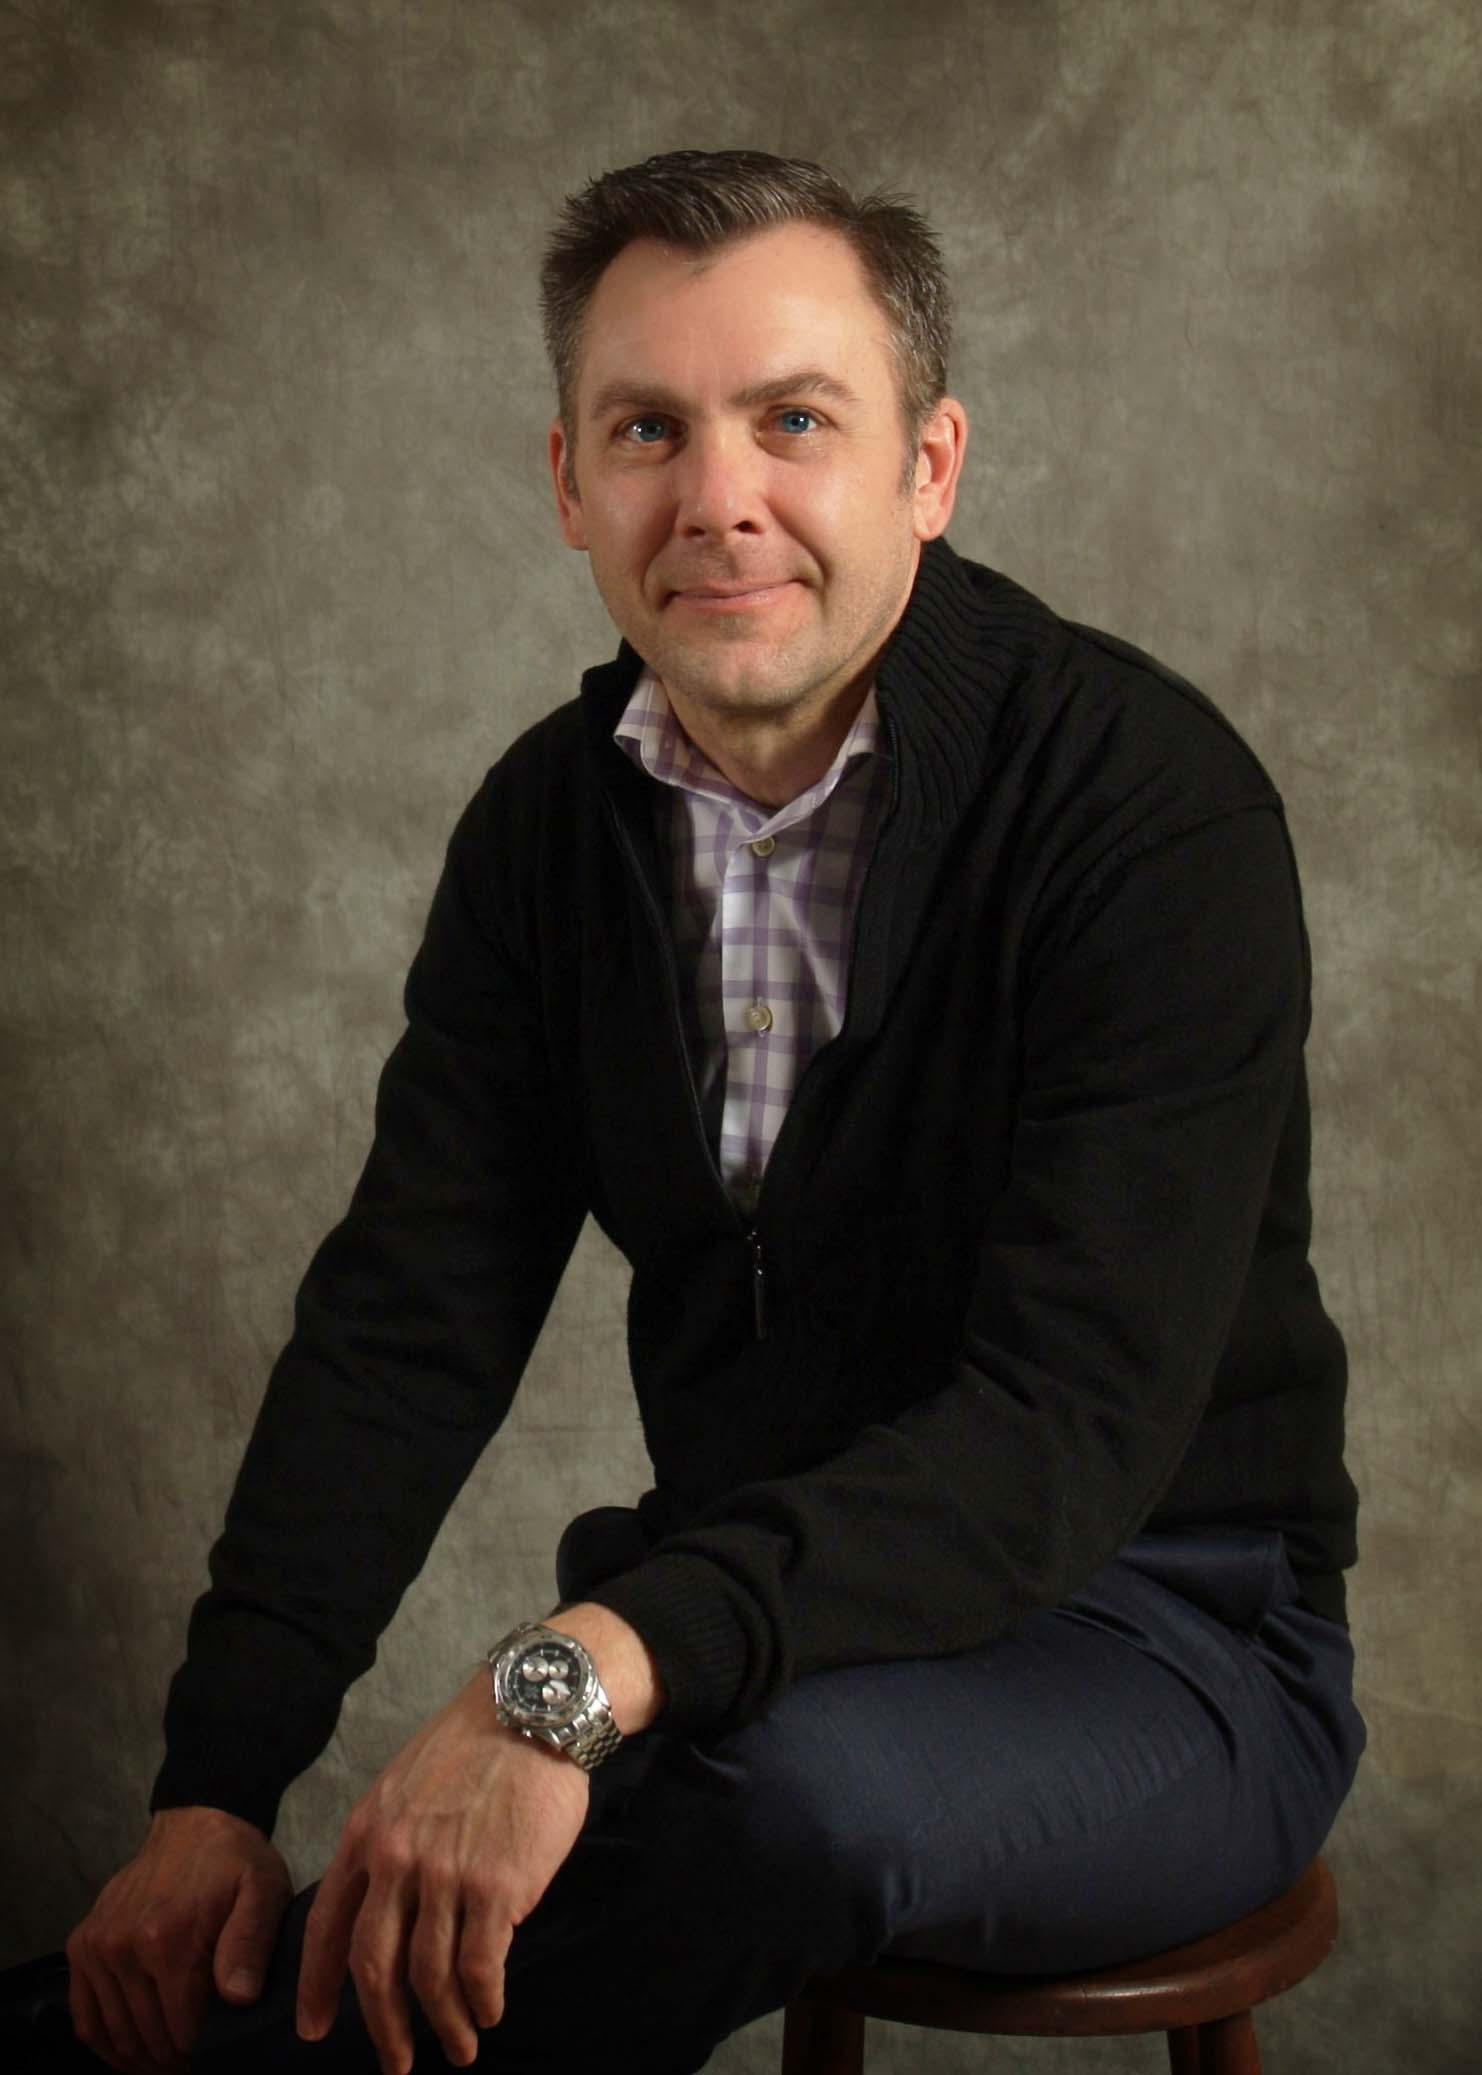 Mark Schnitzler